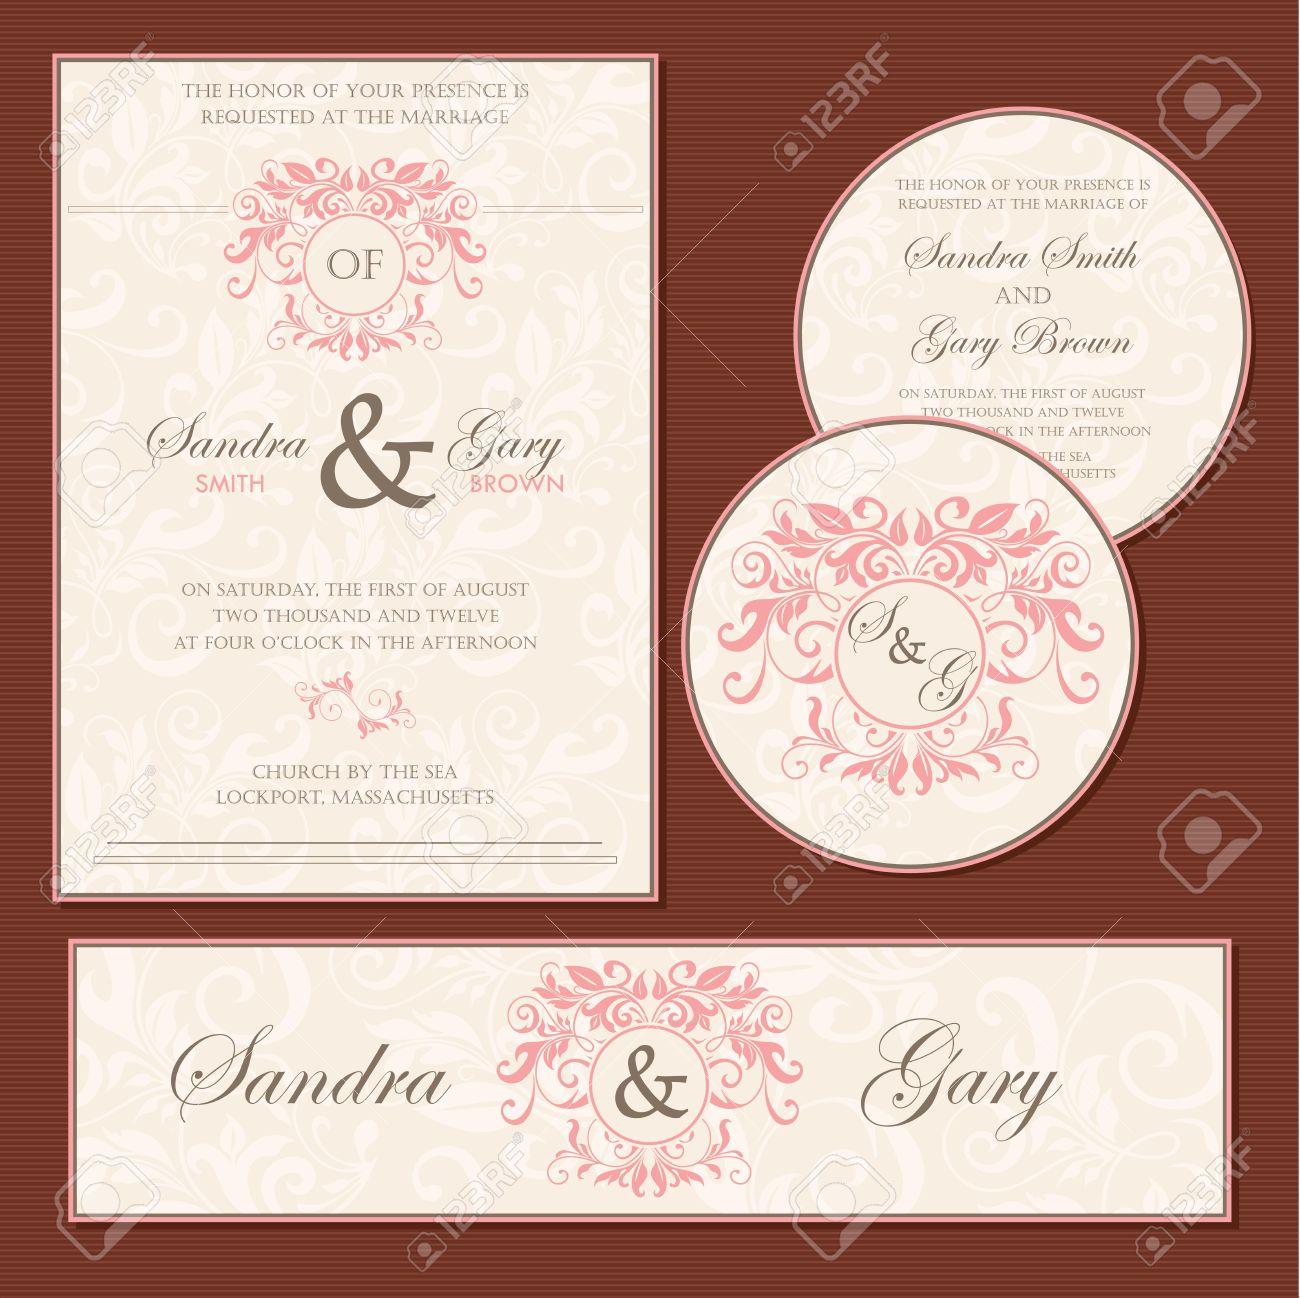 Set of wedding invitation cards invitation thank you card rsvp imagens set of wedding invitation cards invitation thank you card rsvp card save the date stopboris Image collections